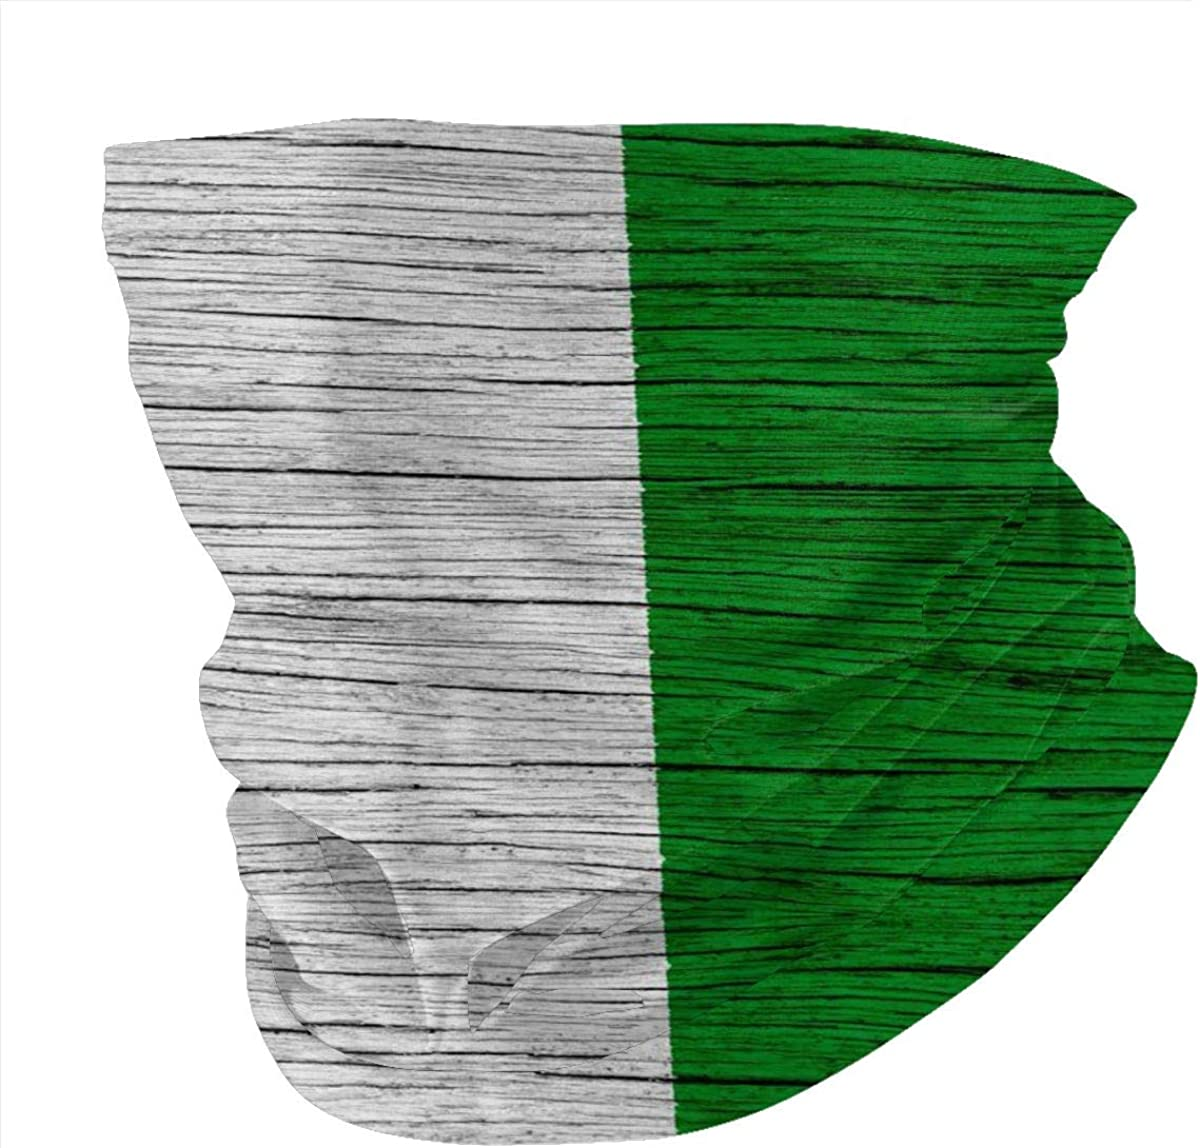 Nigeria Wooden Texture Nigerian Flag Headband Headwear Windbreak Scarf Face Mask Washable Dust Mask Balaclava Neck Bandana